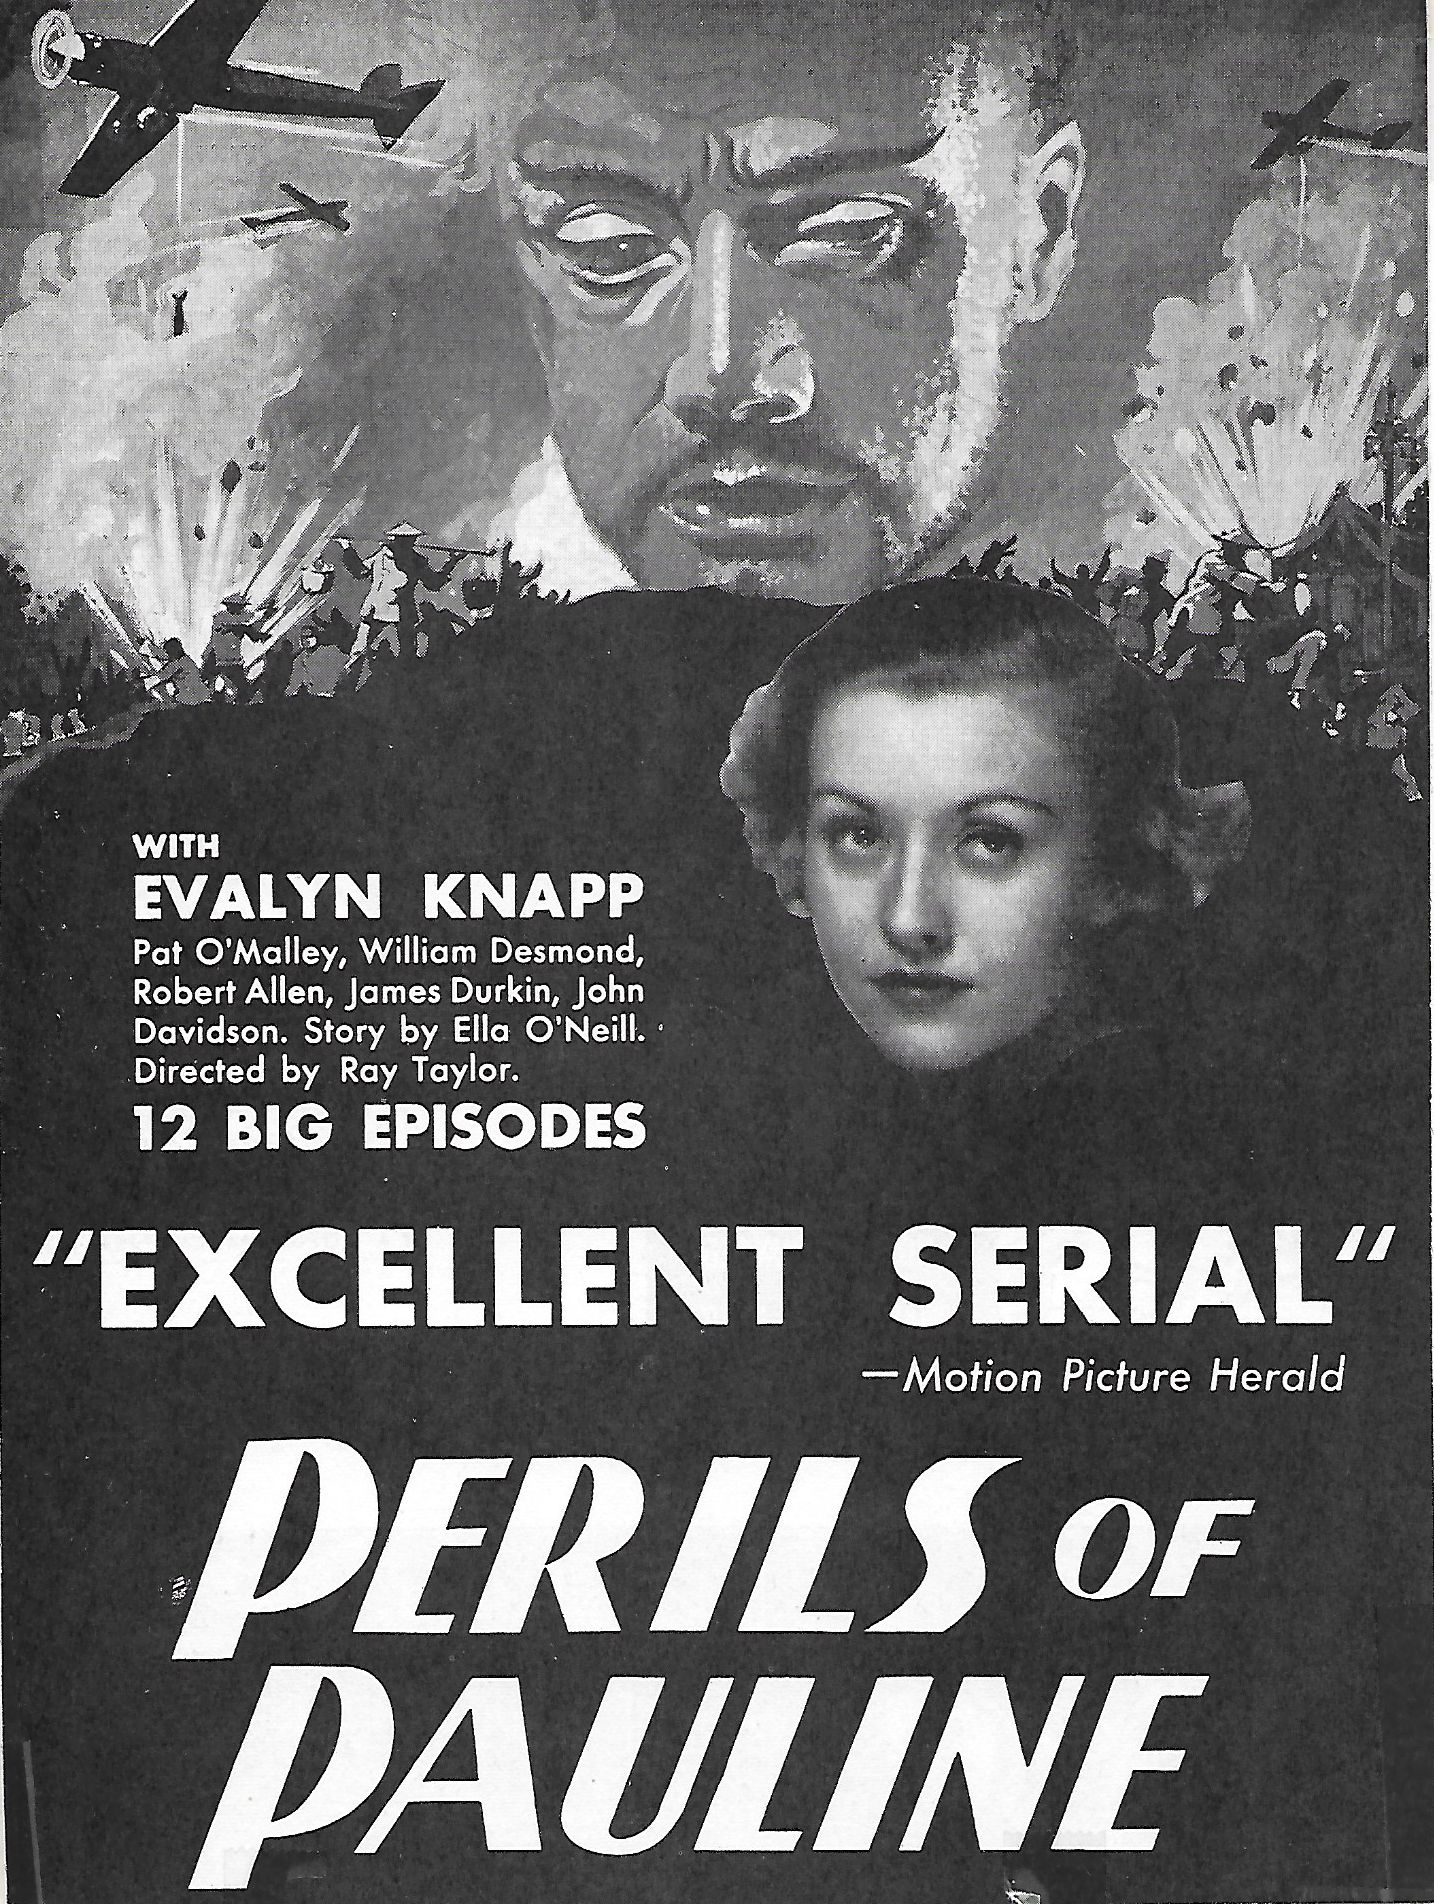 John Davidson and Evalyn Knapp in Perils of Pauline (1933)